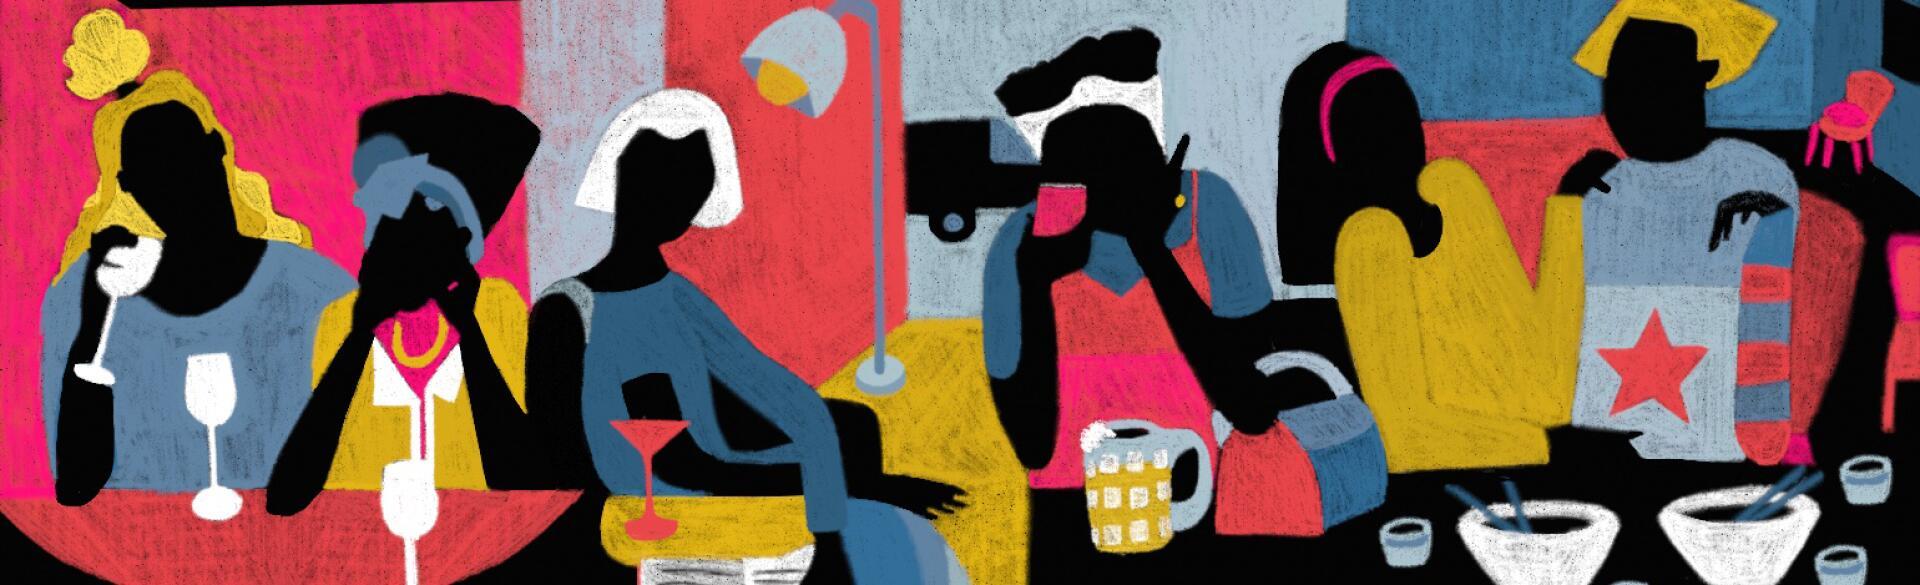 illustration_of_ladies_drinking_by_diana_ejaita_1540x600_.jpg